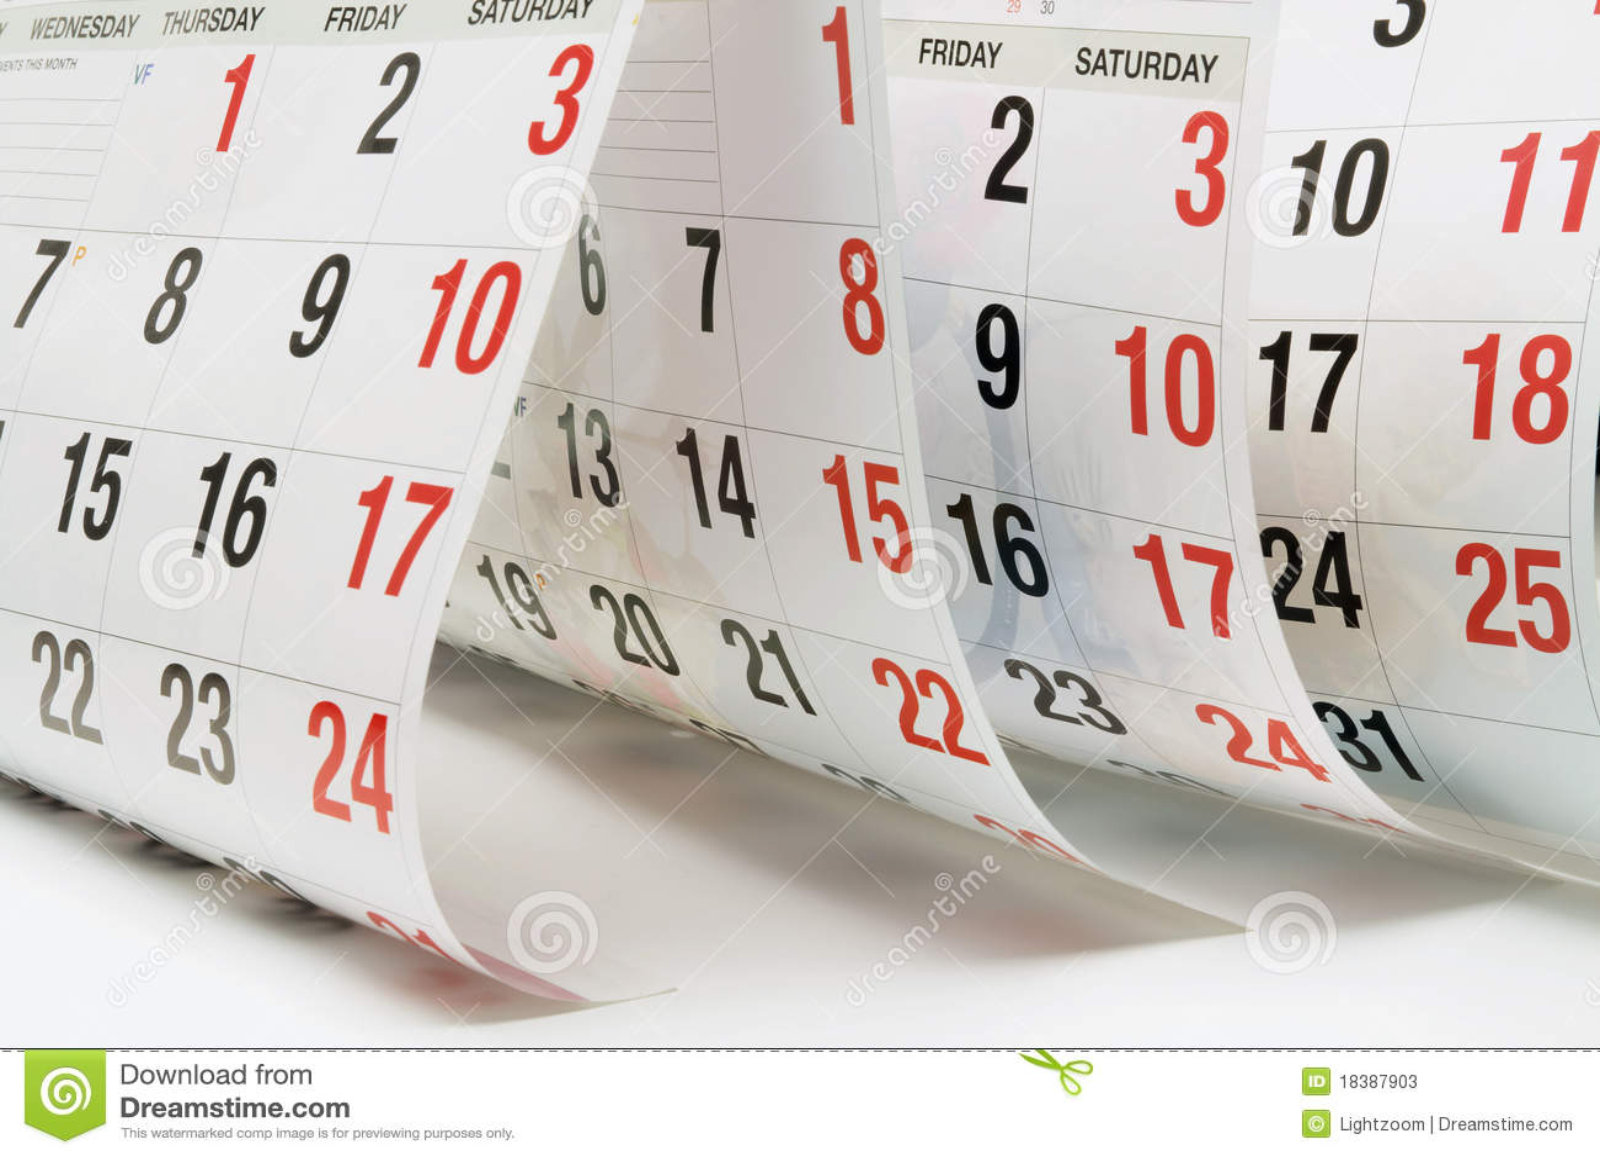 Calendar Pages Stock Photos - Image: 18387903